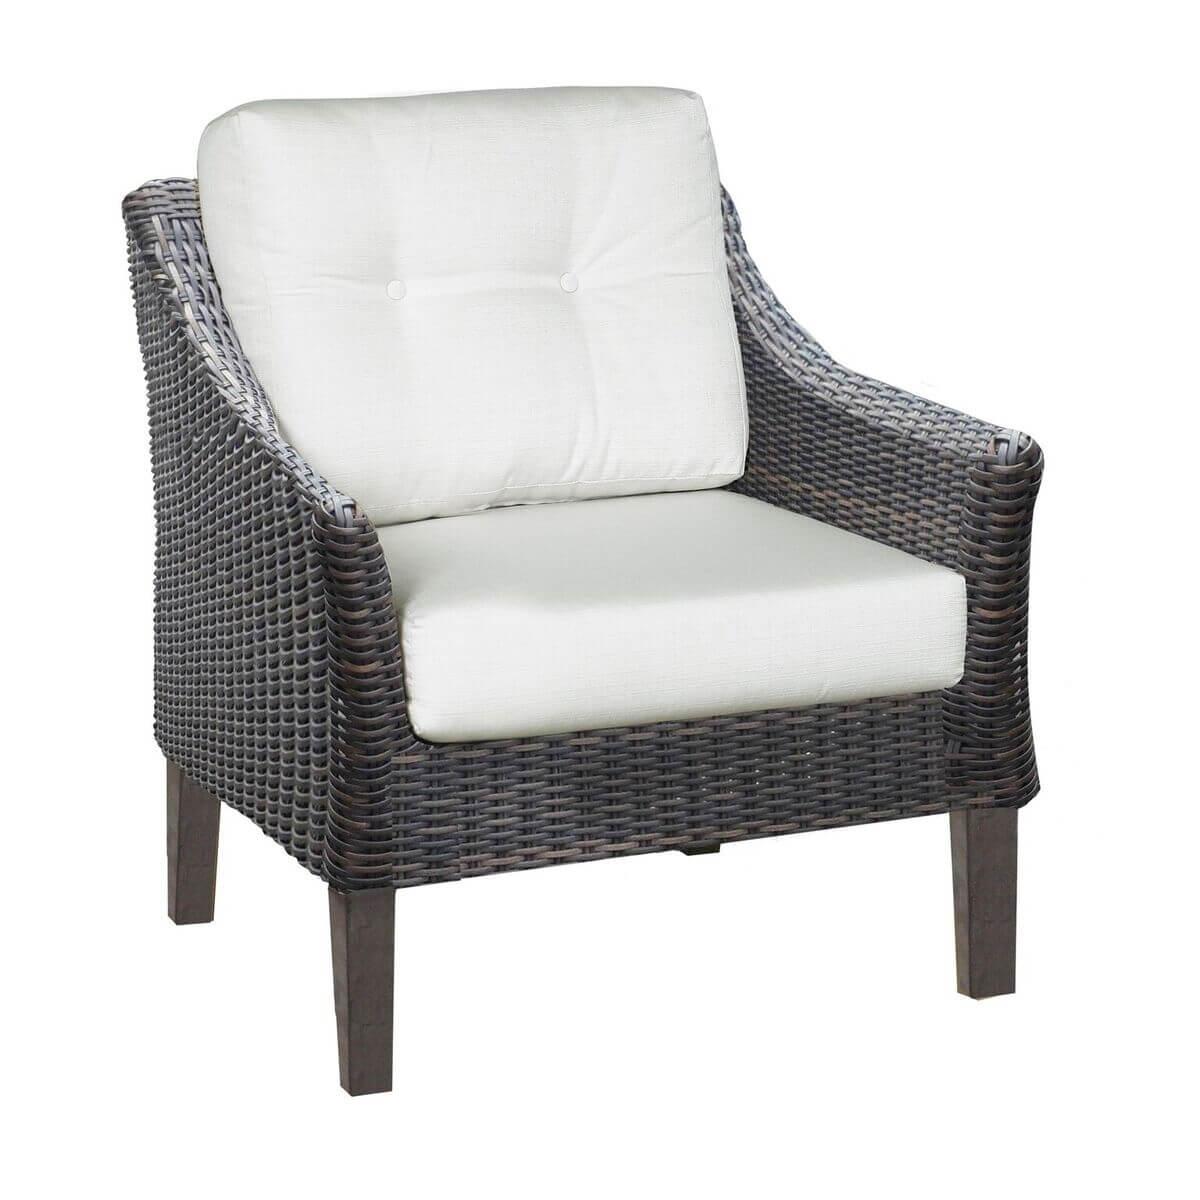 San Marino Outdoor Patio Furniture Chair  PatioHQ